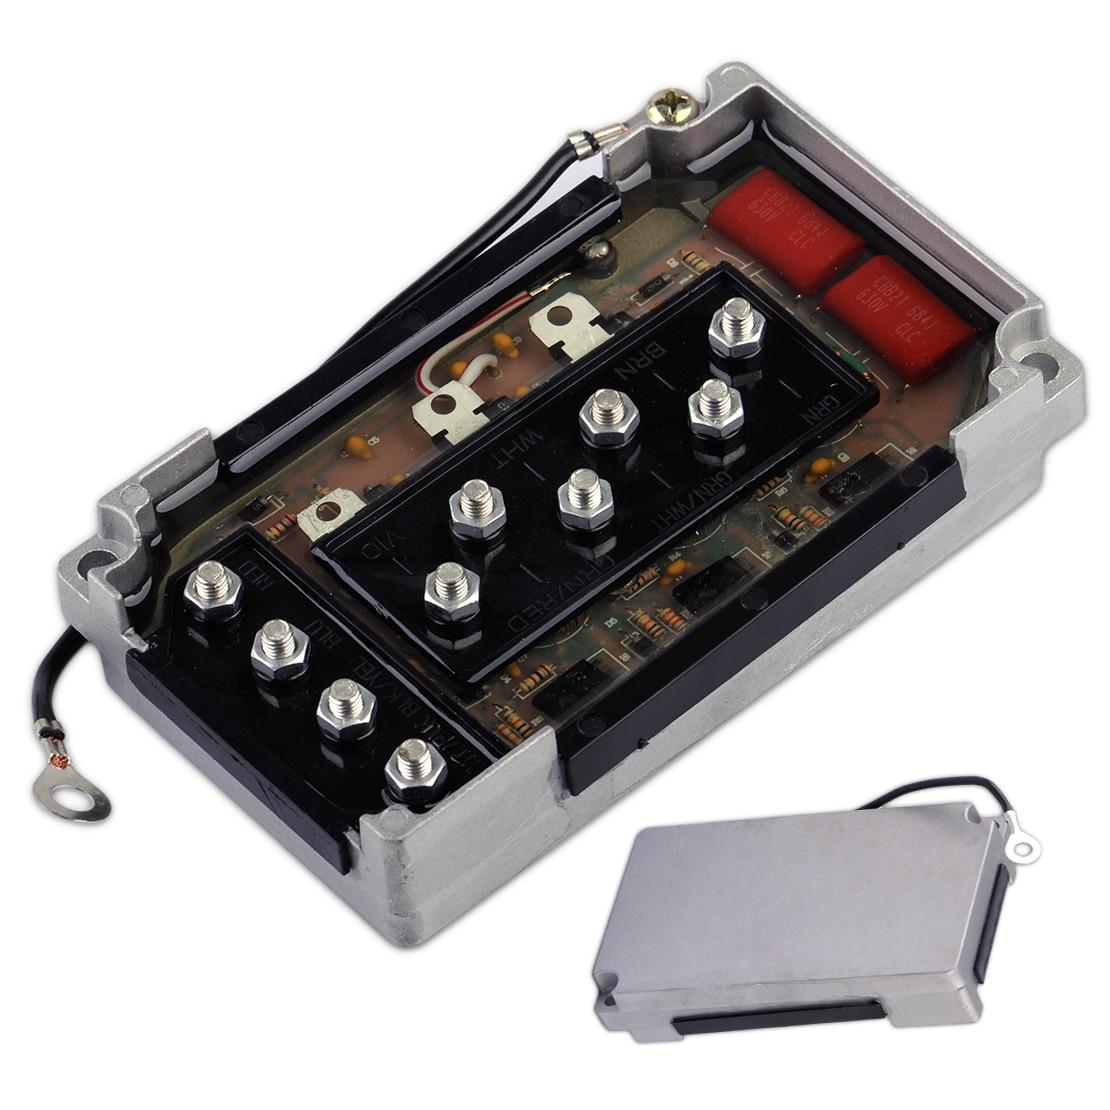 DWCX CDI Switch Box Power Pack 332 7778A12 332 7778 for Mercury 3 6 Cyl 50